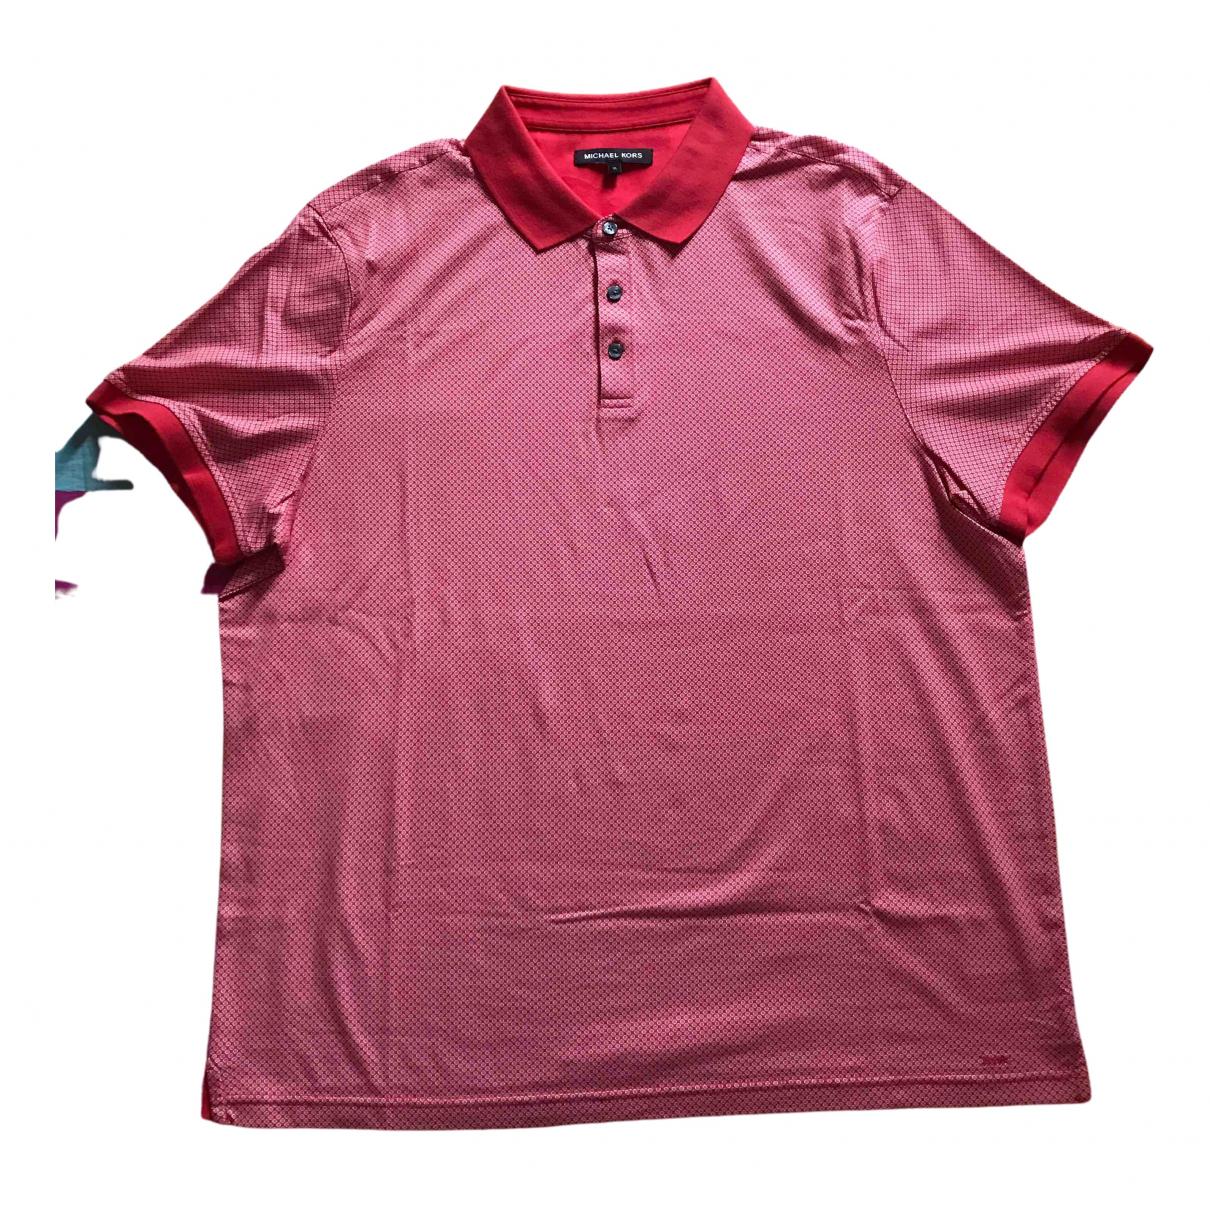 Michael Kors \N Poloshirts in  Rot Baumwolle